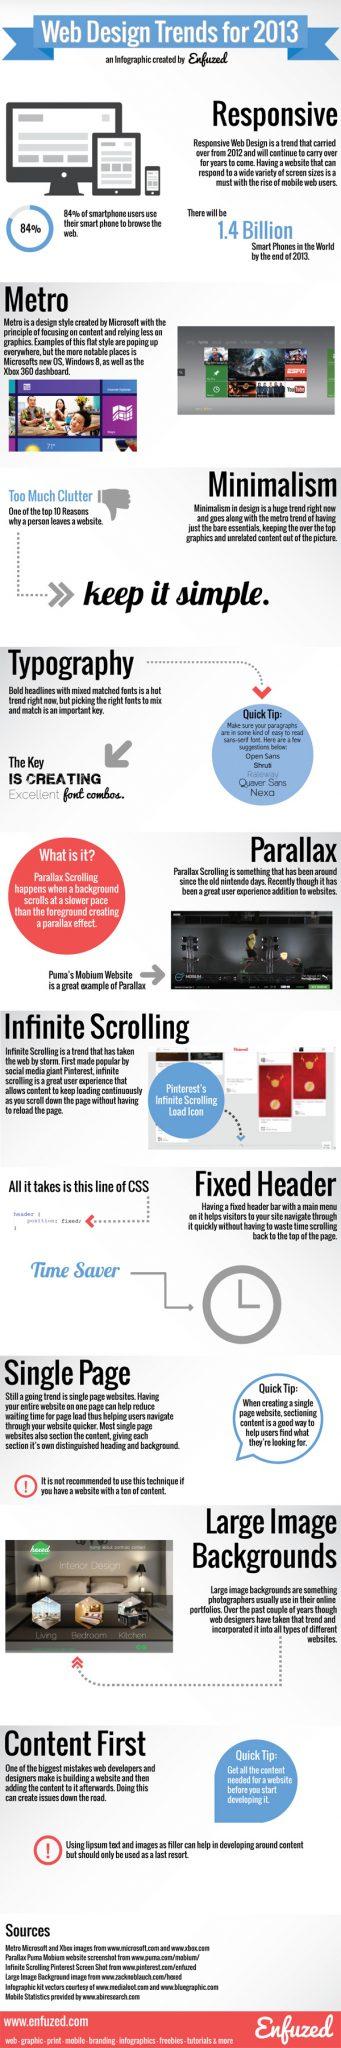 2013-Web-Design-Trends-Infographic